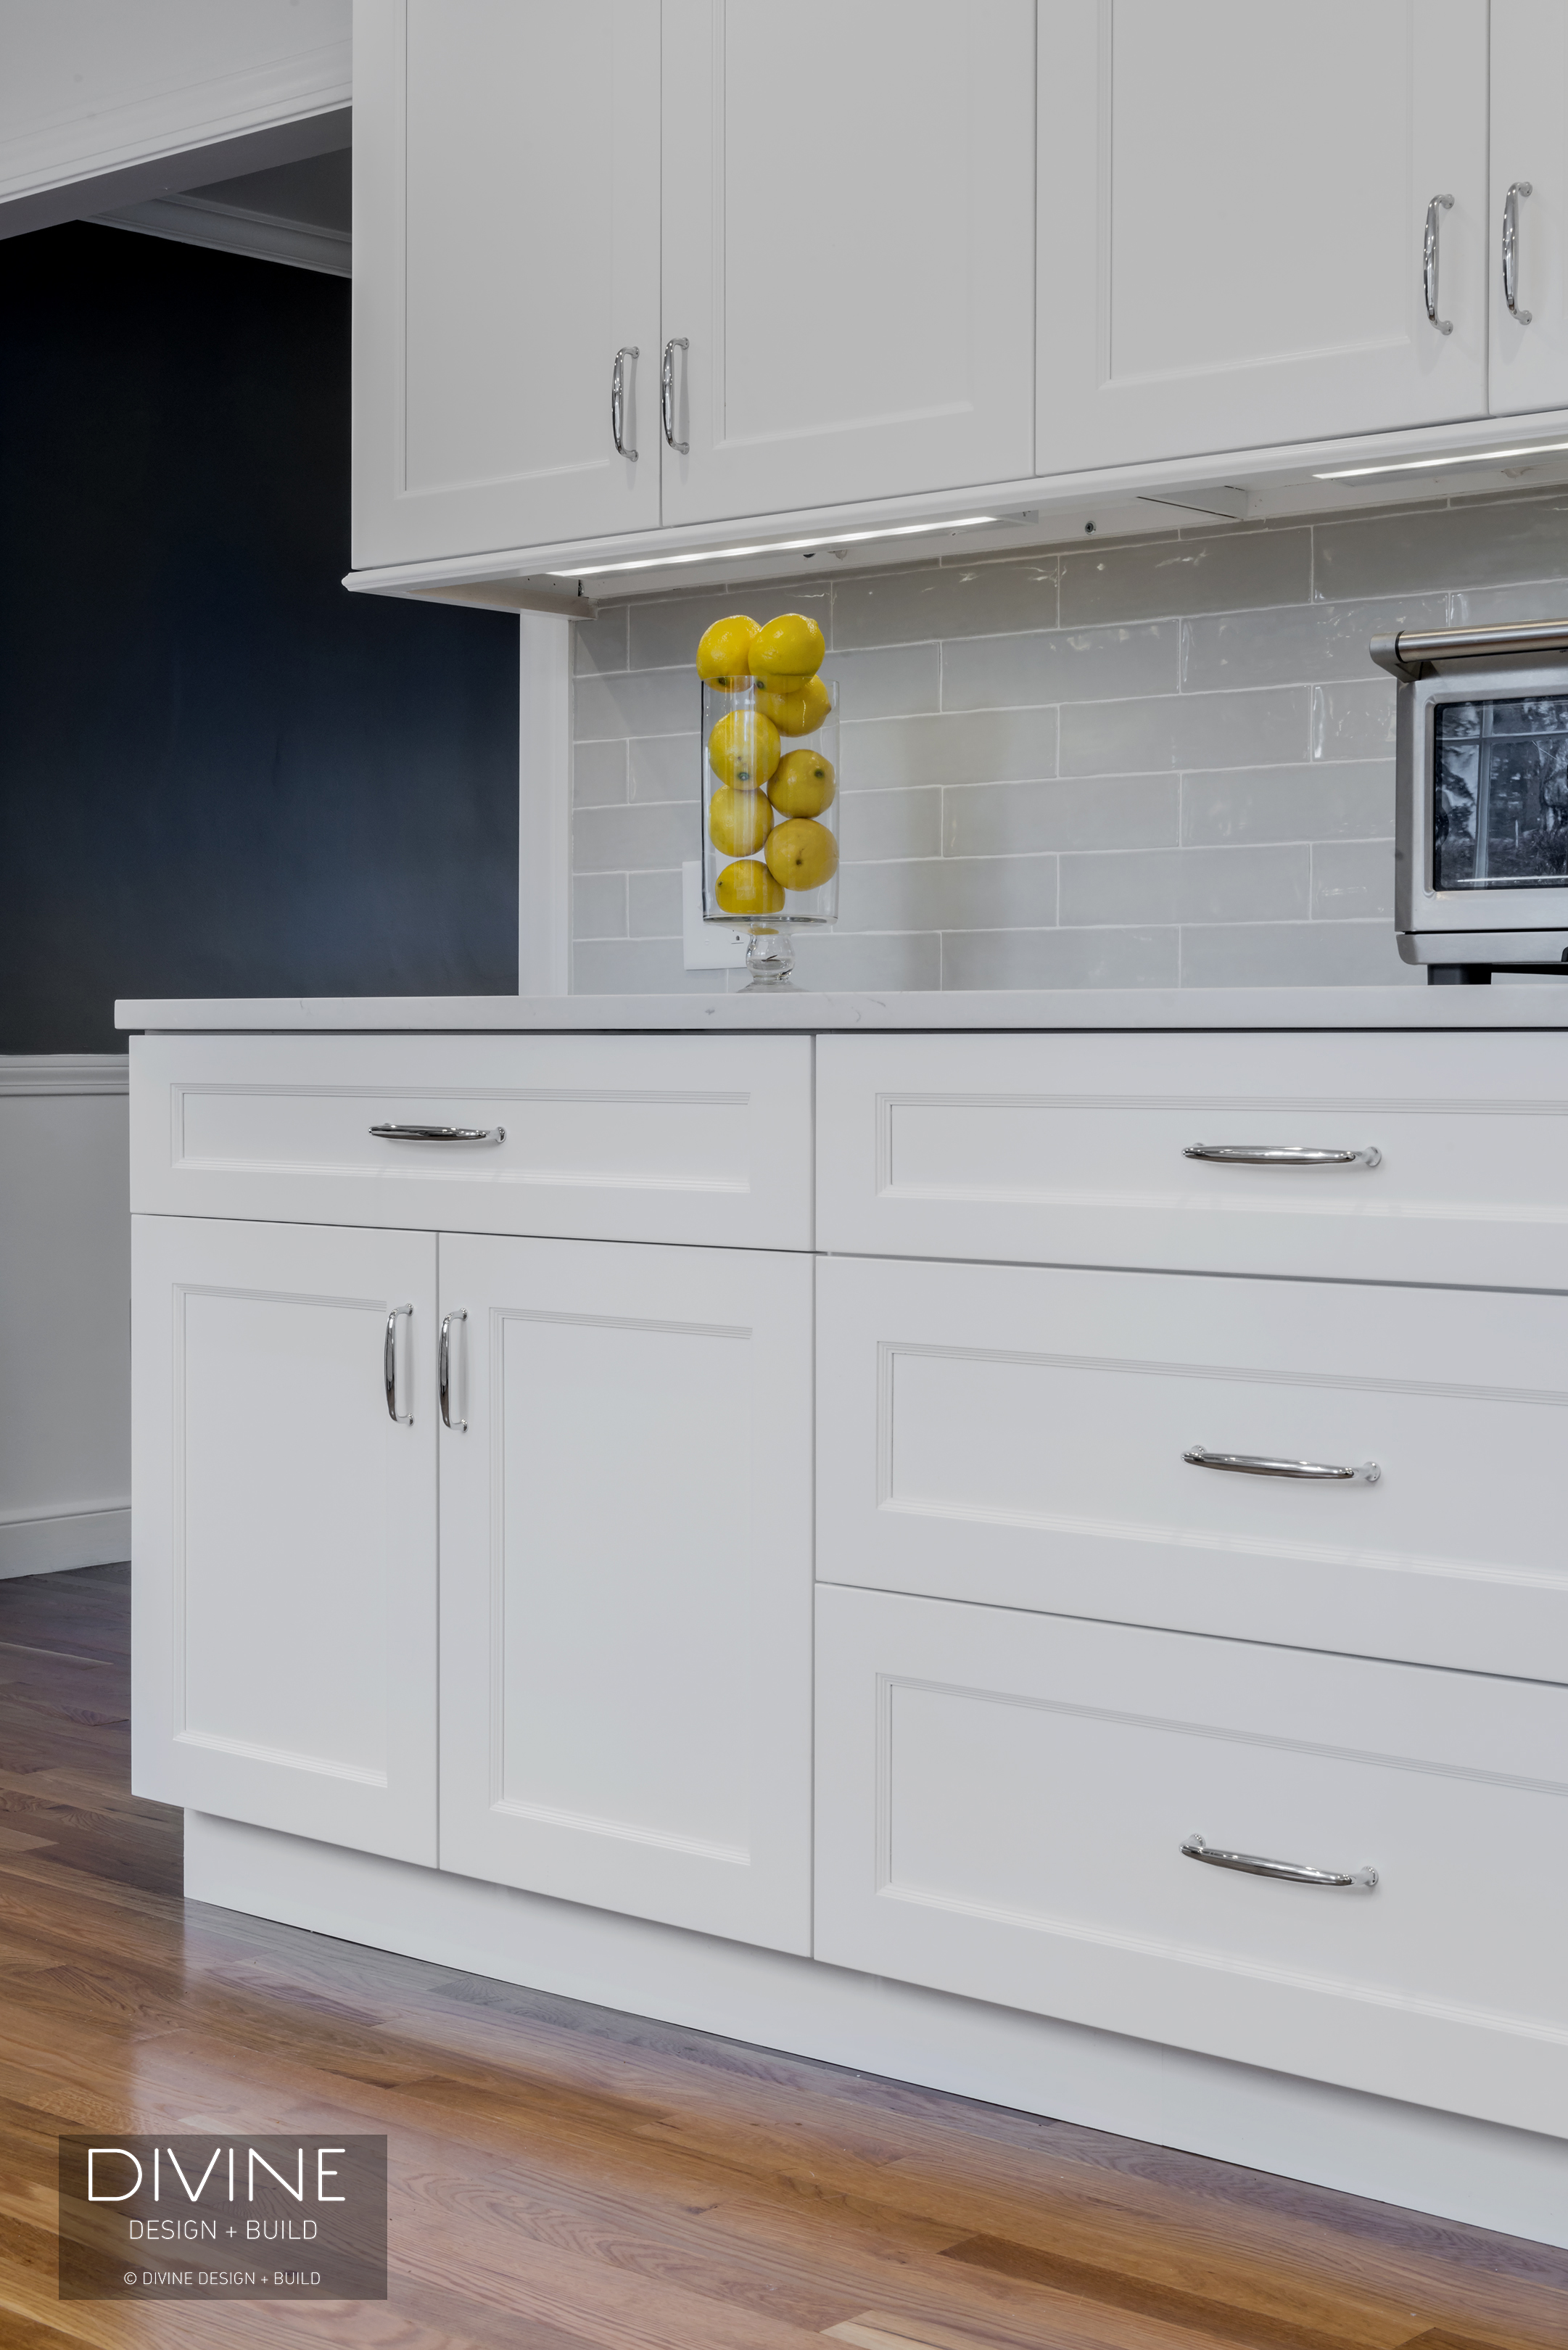 8 Pictures Of Kitchens With Subway Tile Backsplashes Divine Design Build